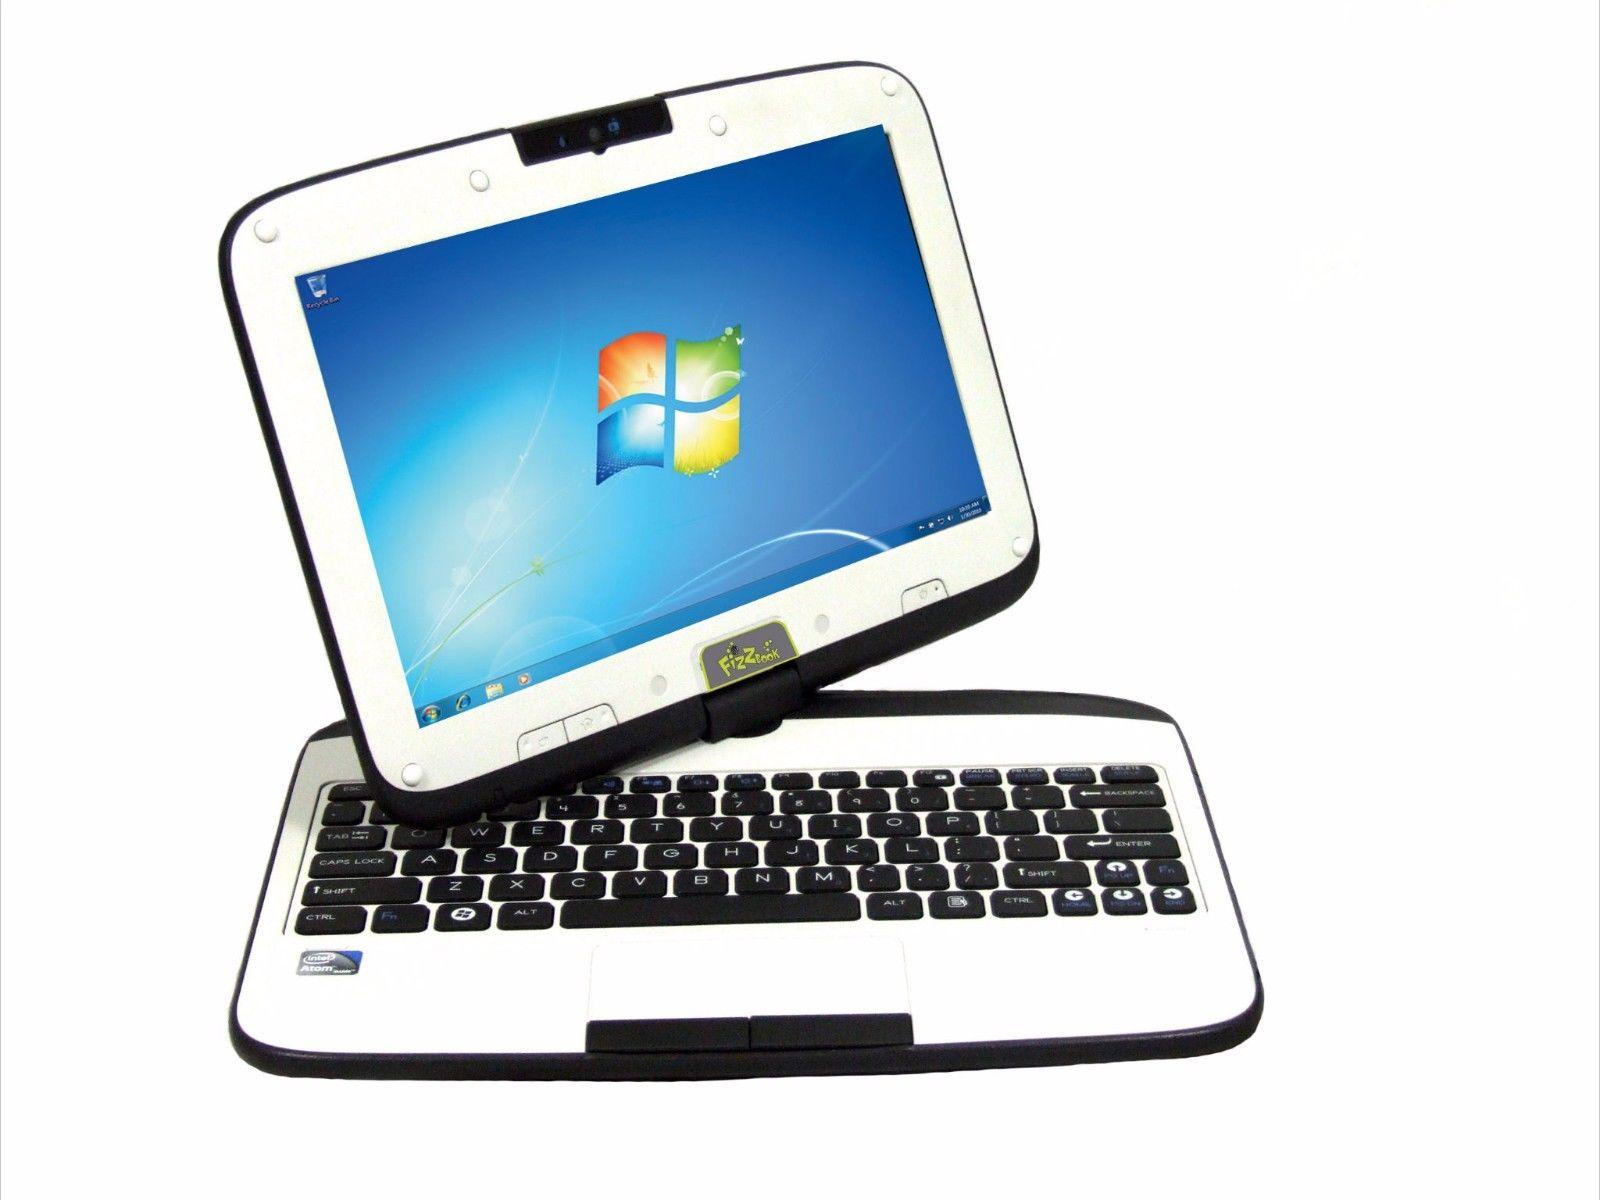 zoostorm fizzbook barebone laptop £39.99 ebay / zoostorm-sales